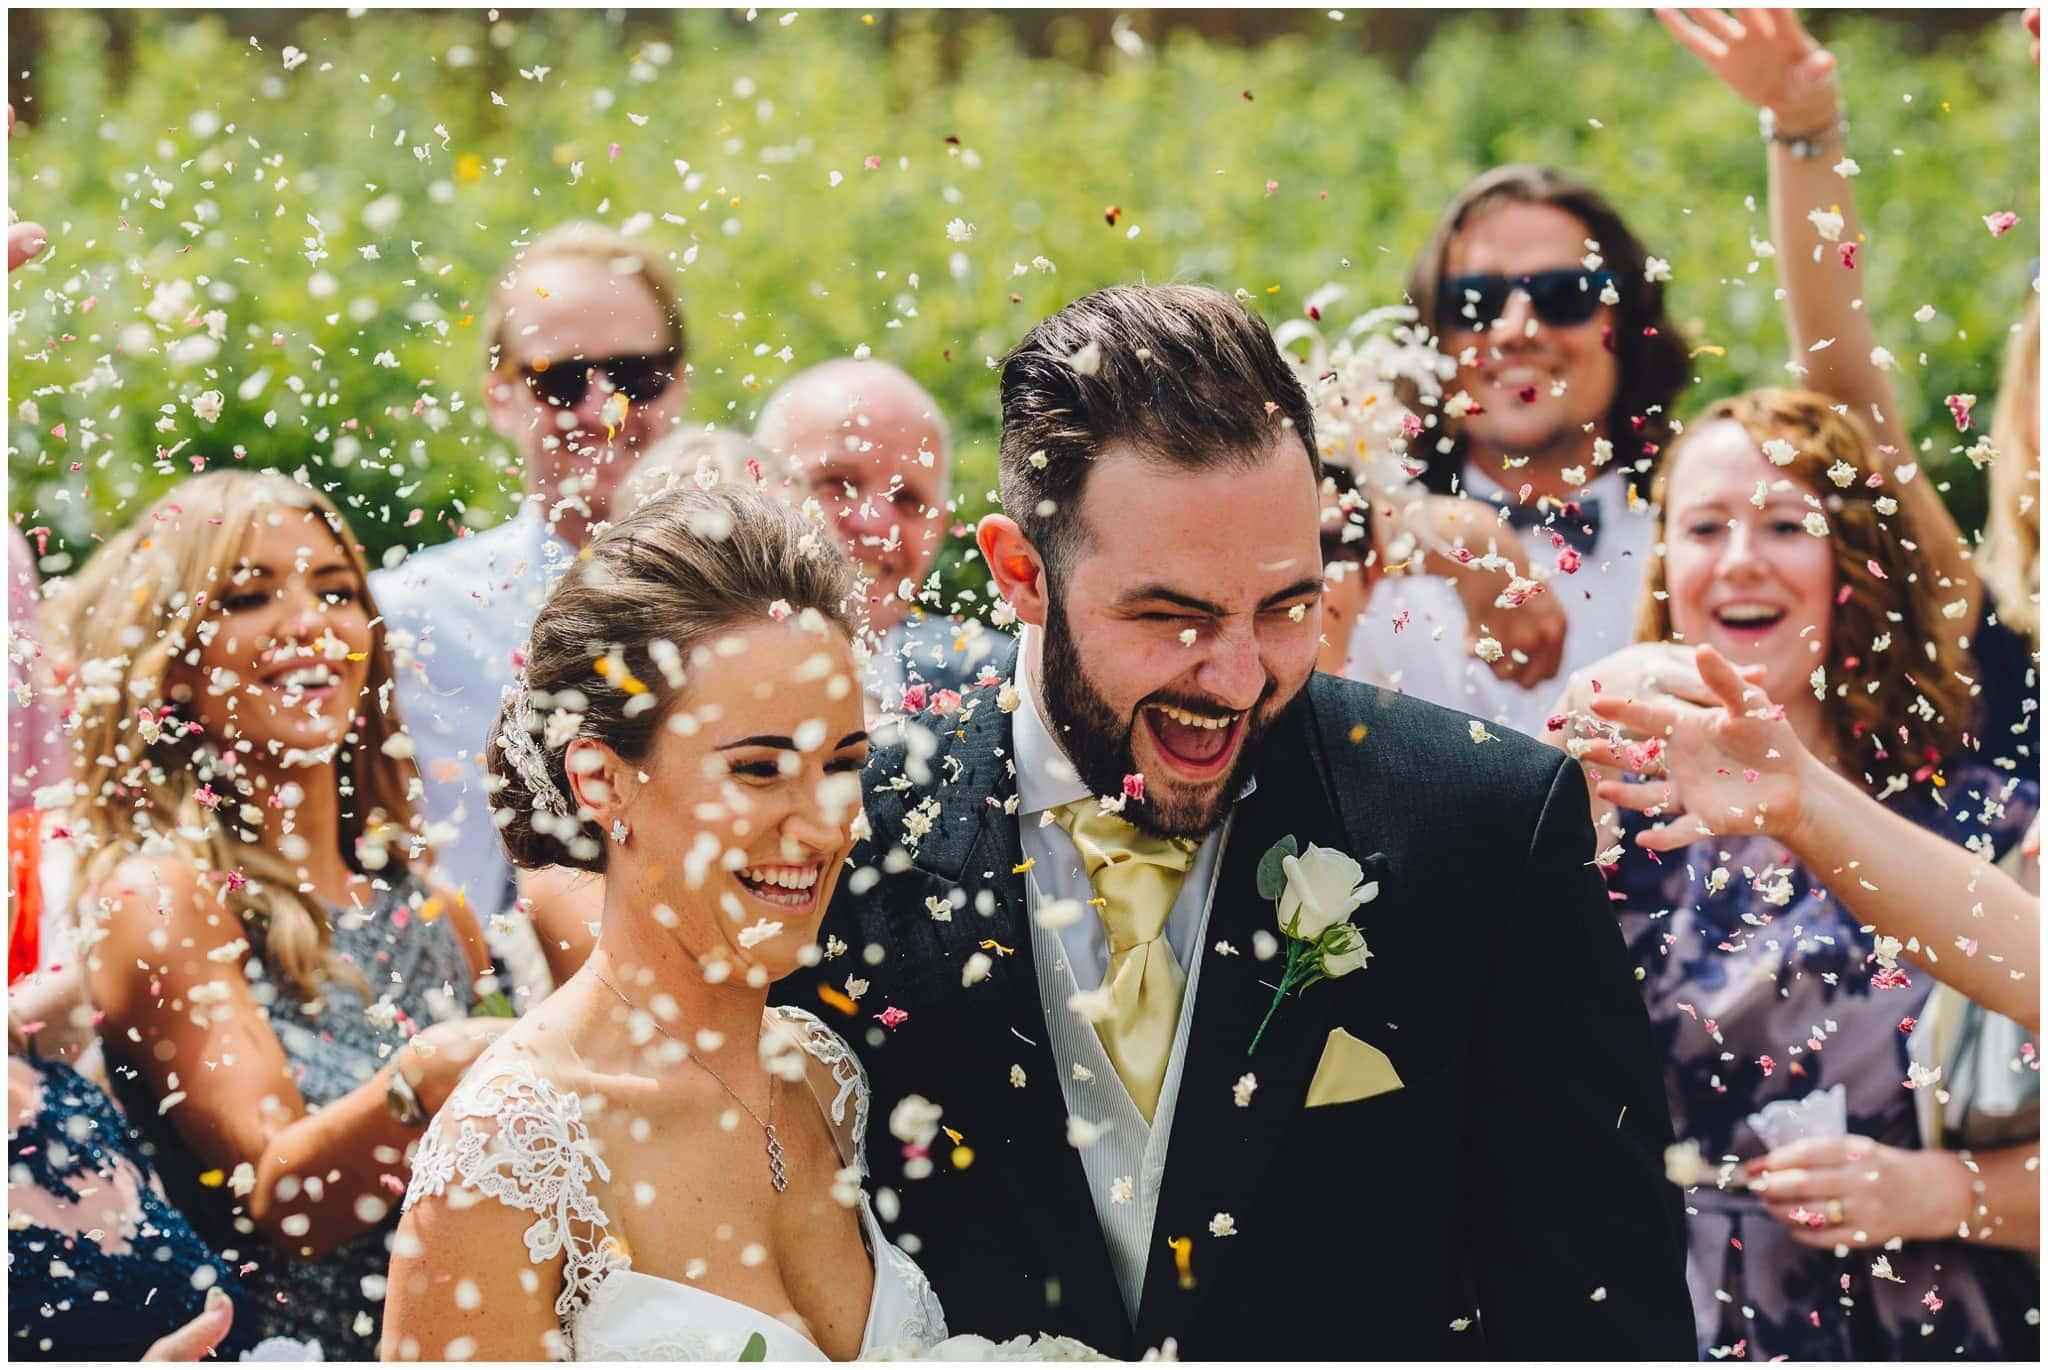 combermere-abbey-wedding-photographer-52